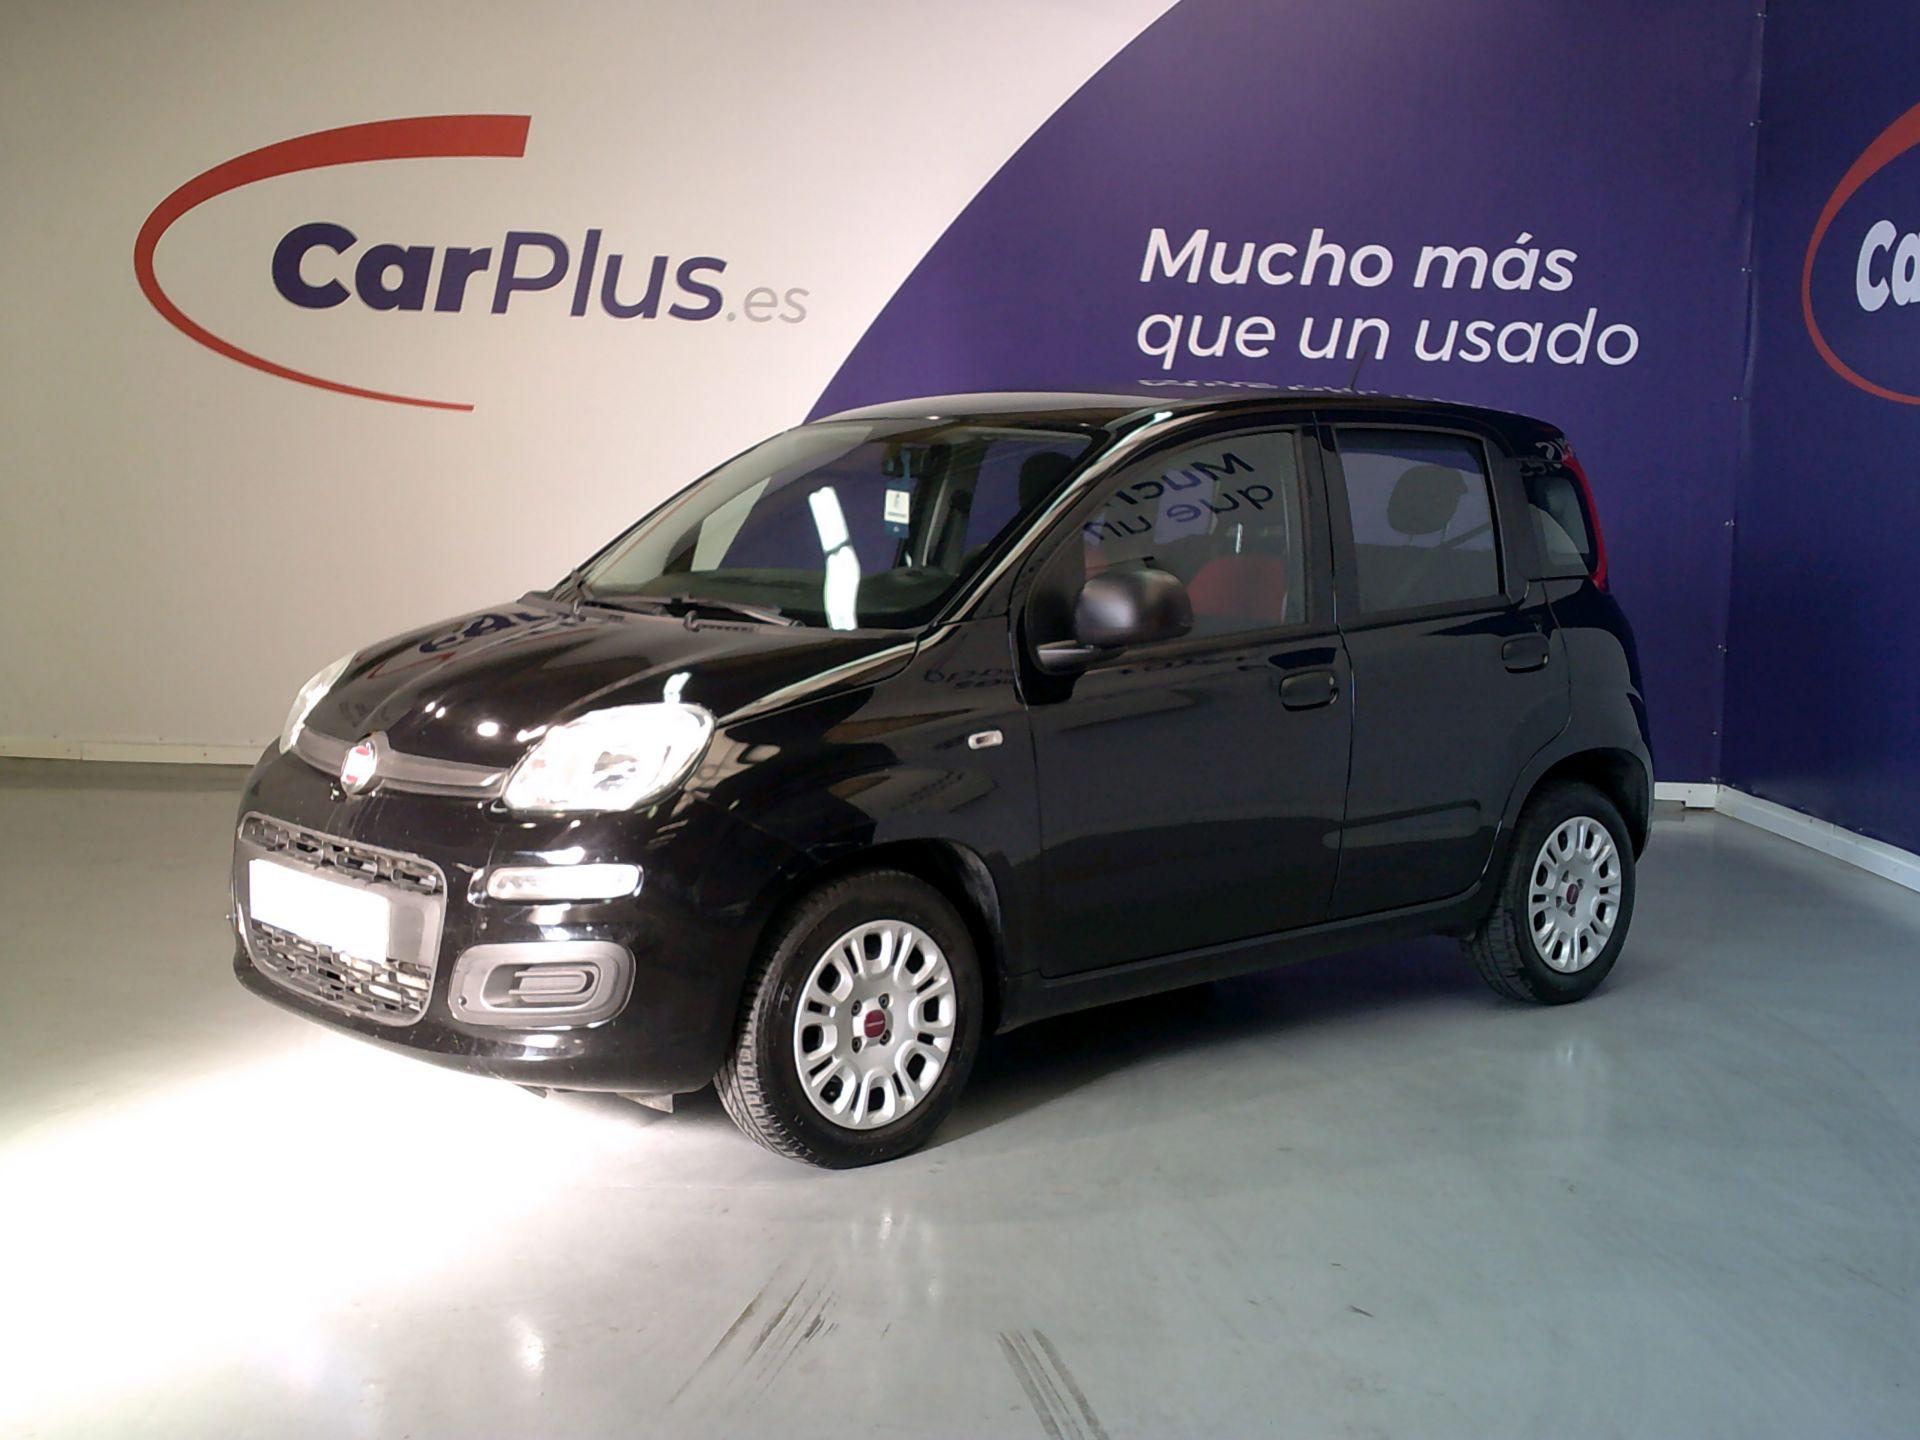 Fiat Panda 1.2 Easy 51kW (69CV) segunda mano Madrid